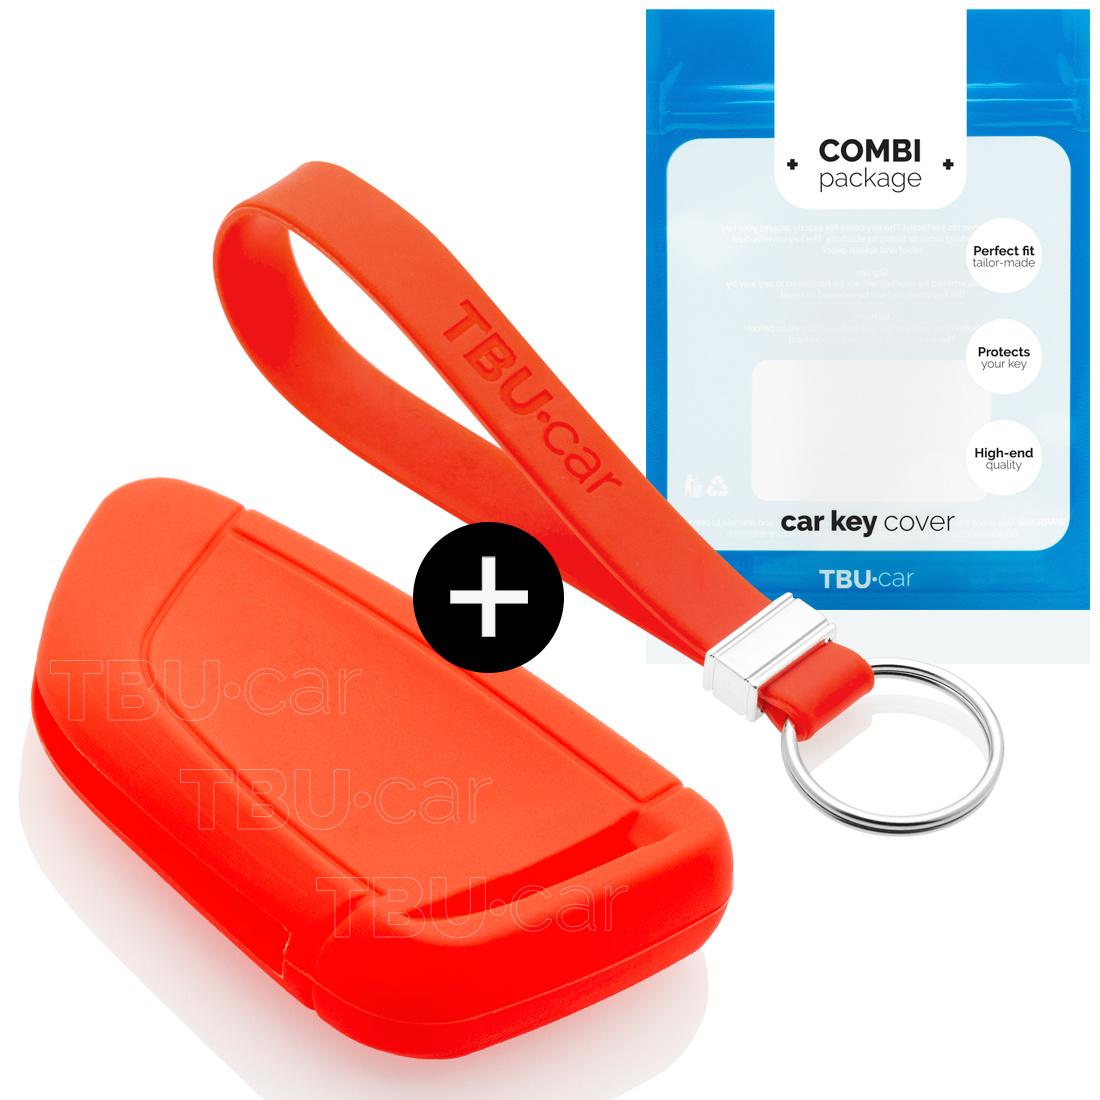 TBU car TBU car Sleutel cover compatibel met BMW - Silicone sleutelhoesje - beschermhoesje autosleutel - Rood